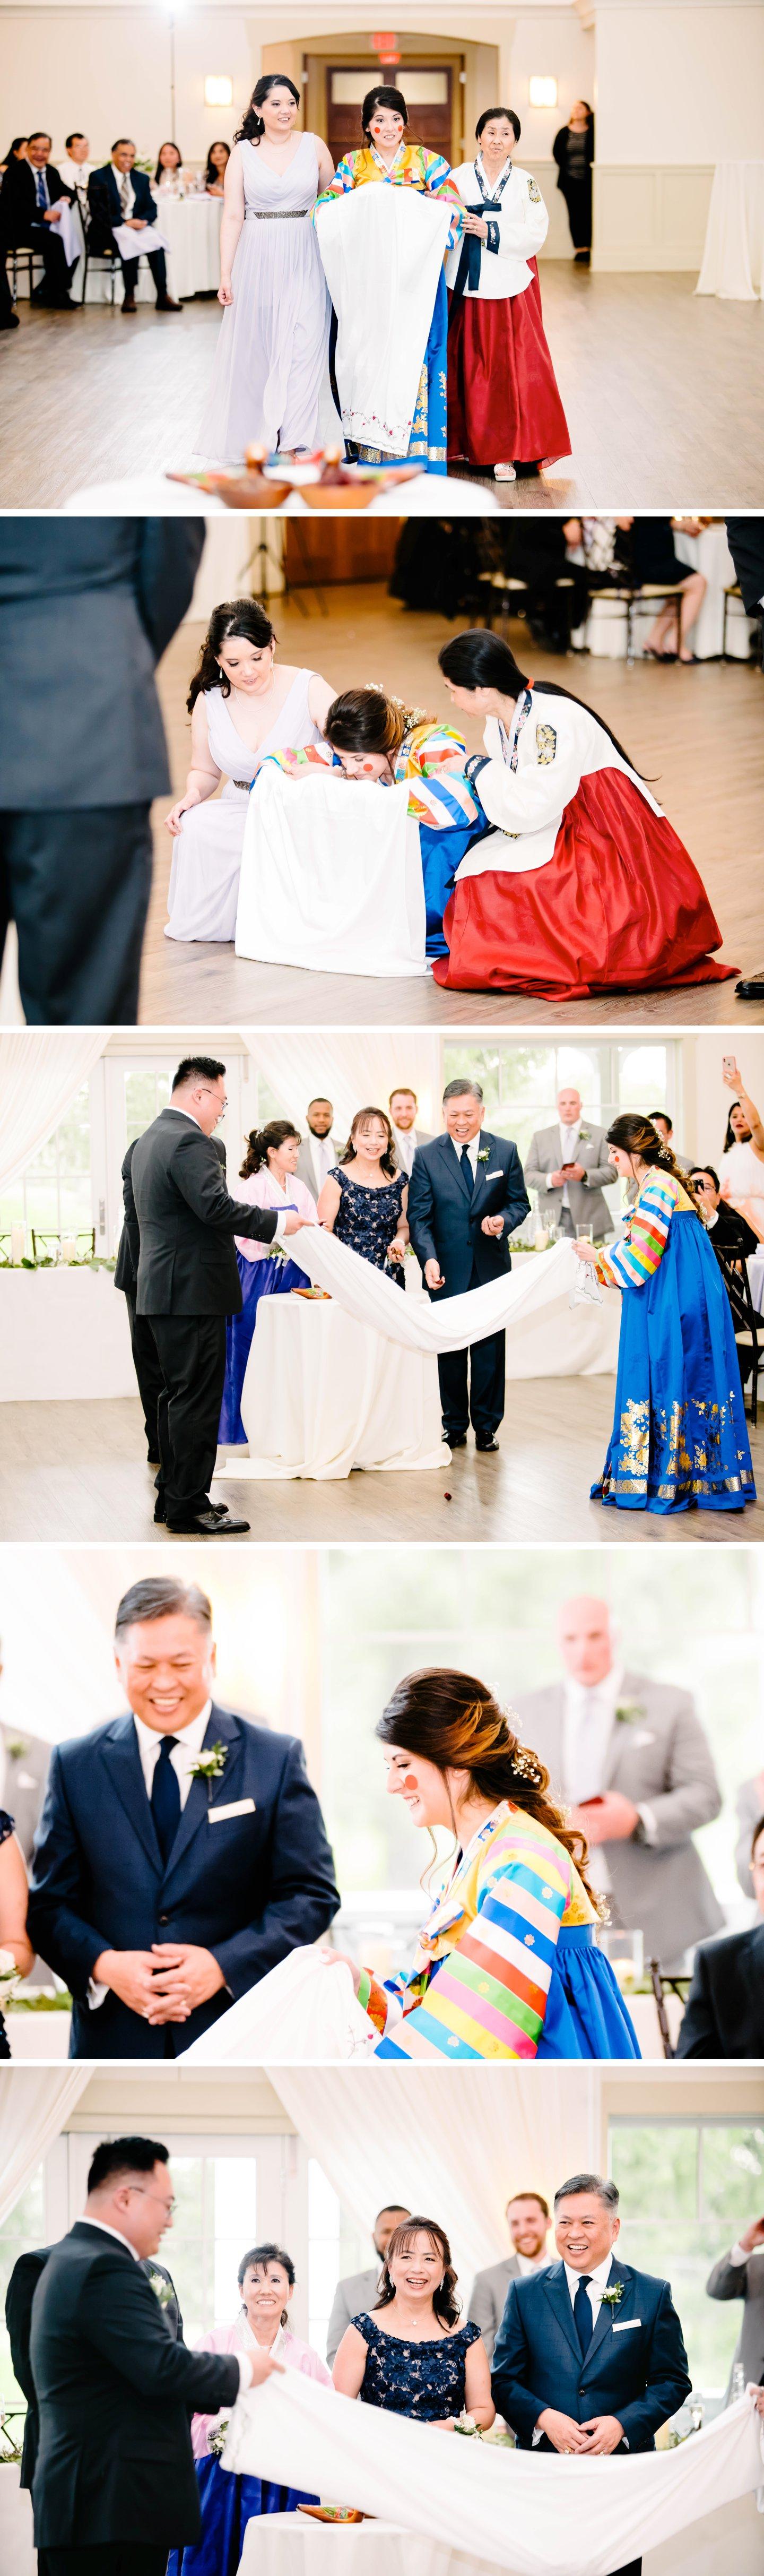 lake-geneva-fine-art-wedding-photographer-santos62